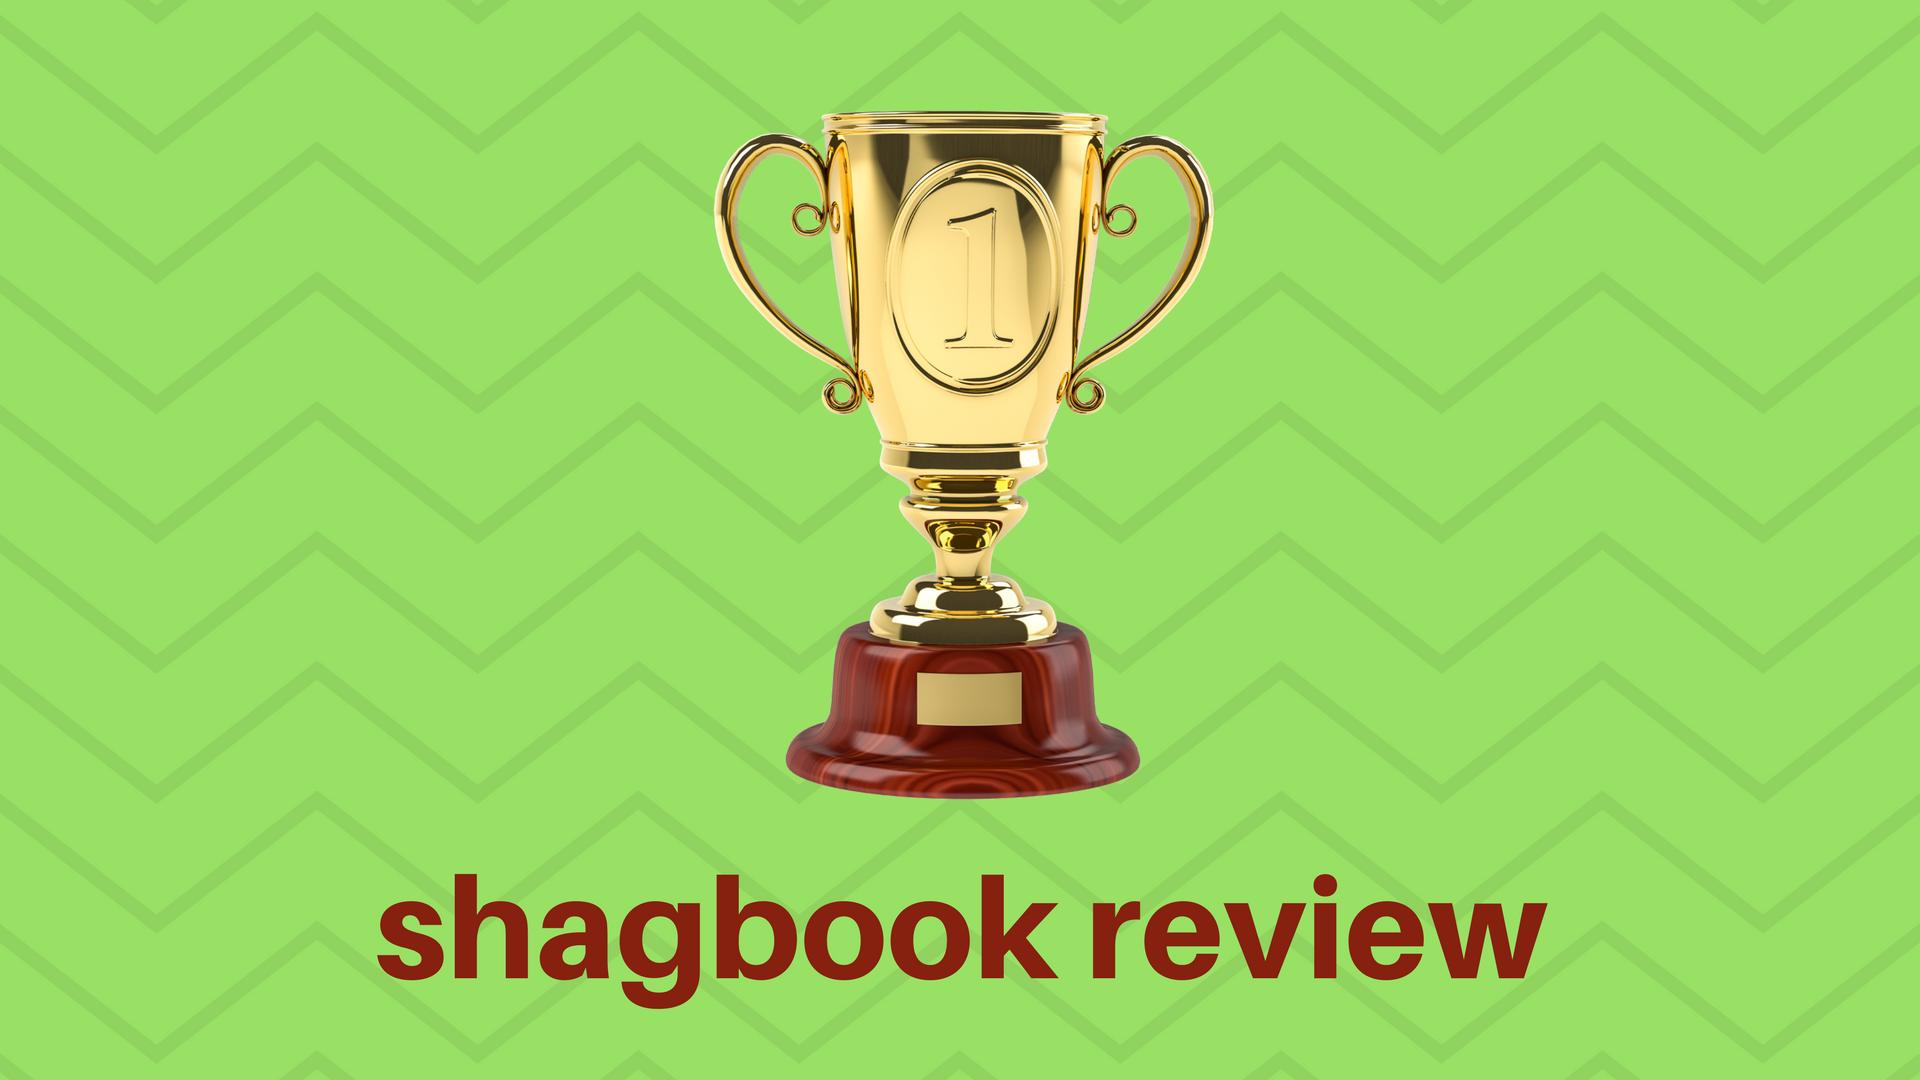 Free shagbook